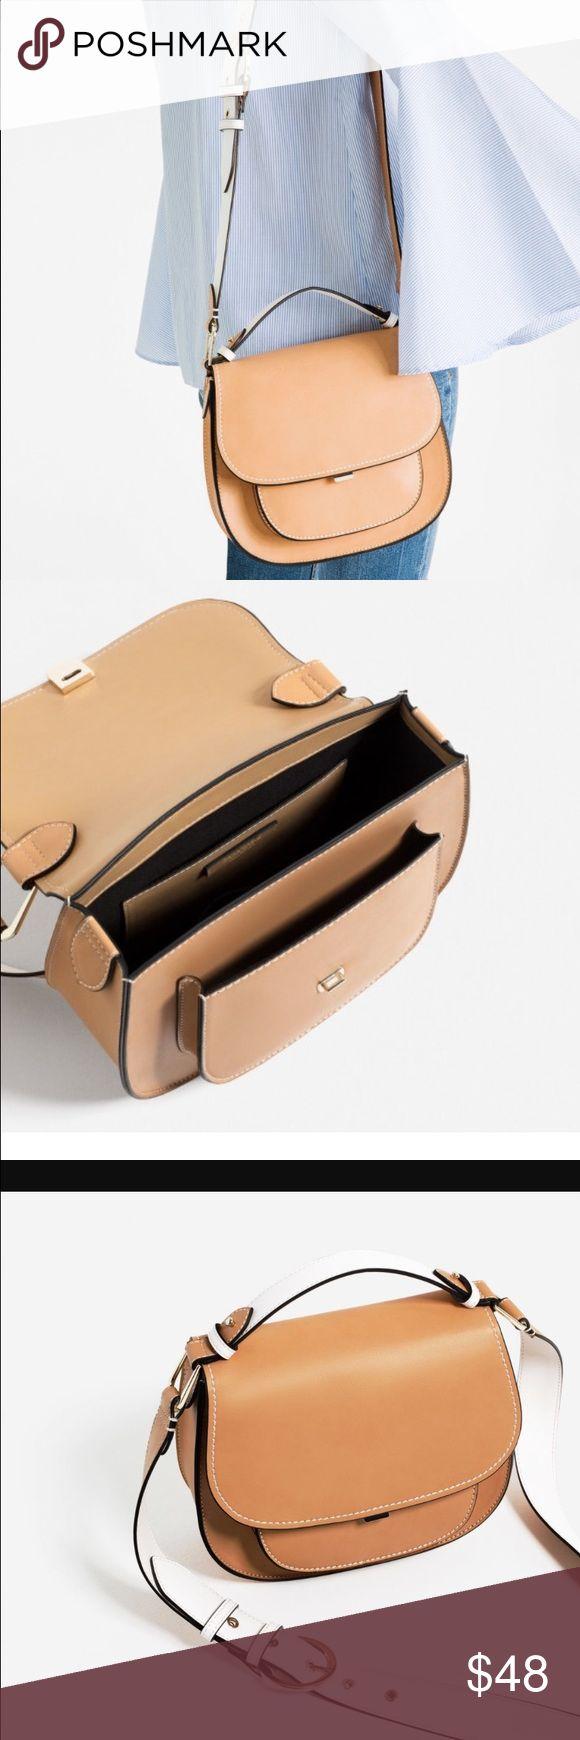 Zara crossbody bag. Brand new. Contrast strap crossbody bag. Impulse buy I realized I don't need. Never used.  Outside is polyurethane. Zara Bags Crossbody Bags